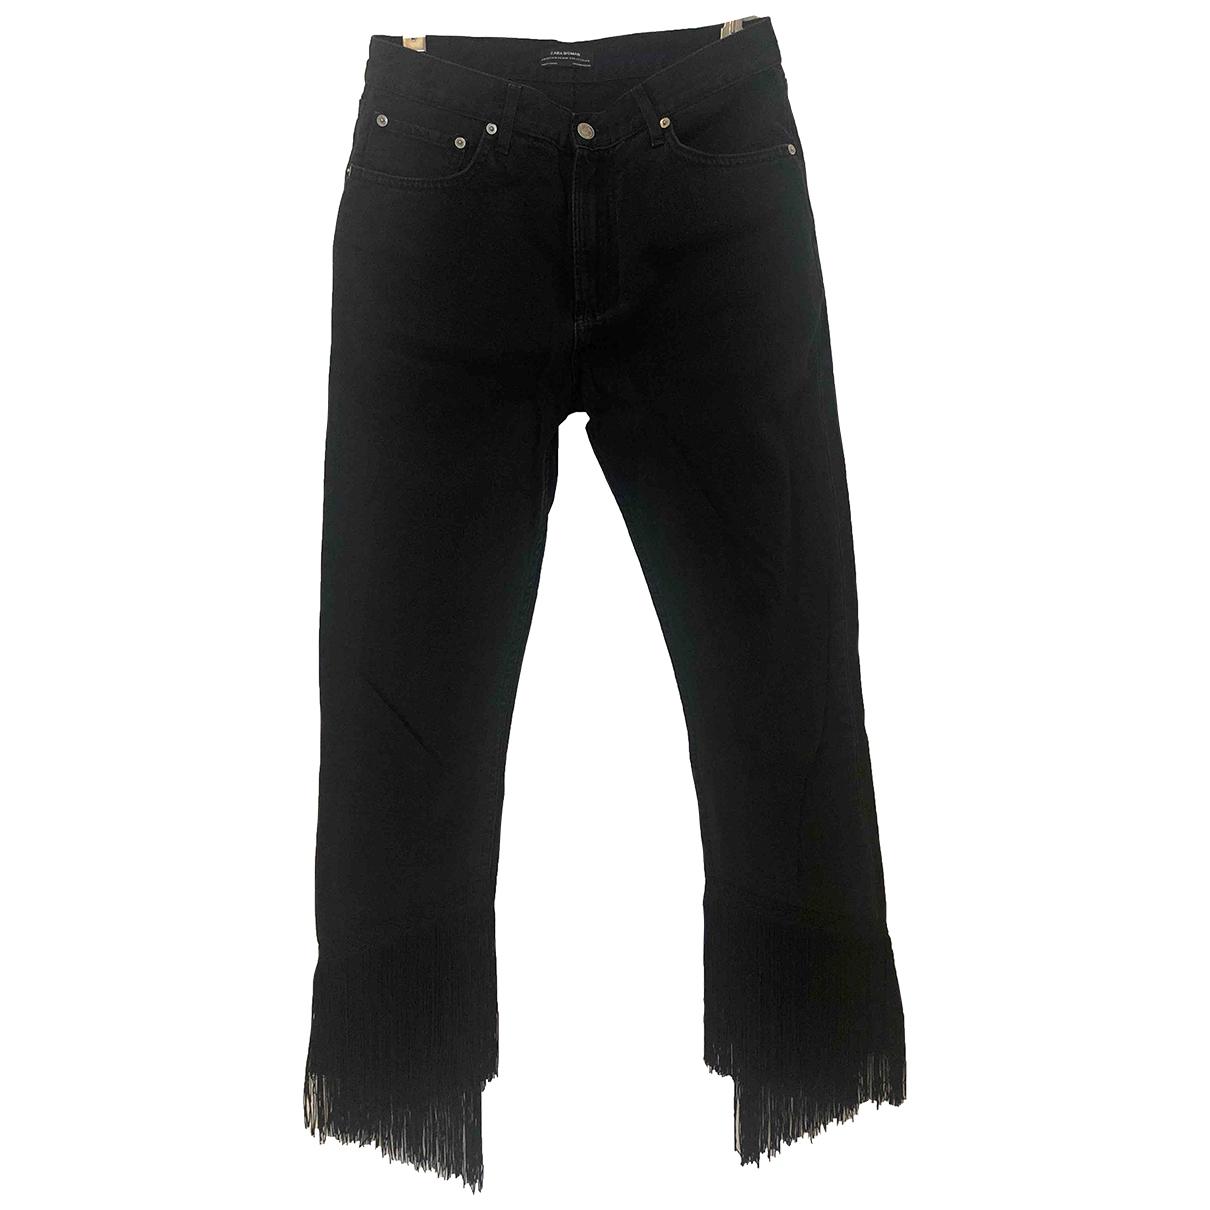 Zara \N Black Cotton Jeans for Women 26 US